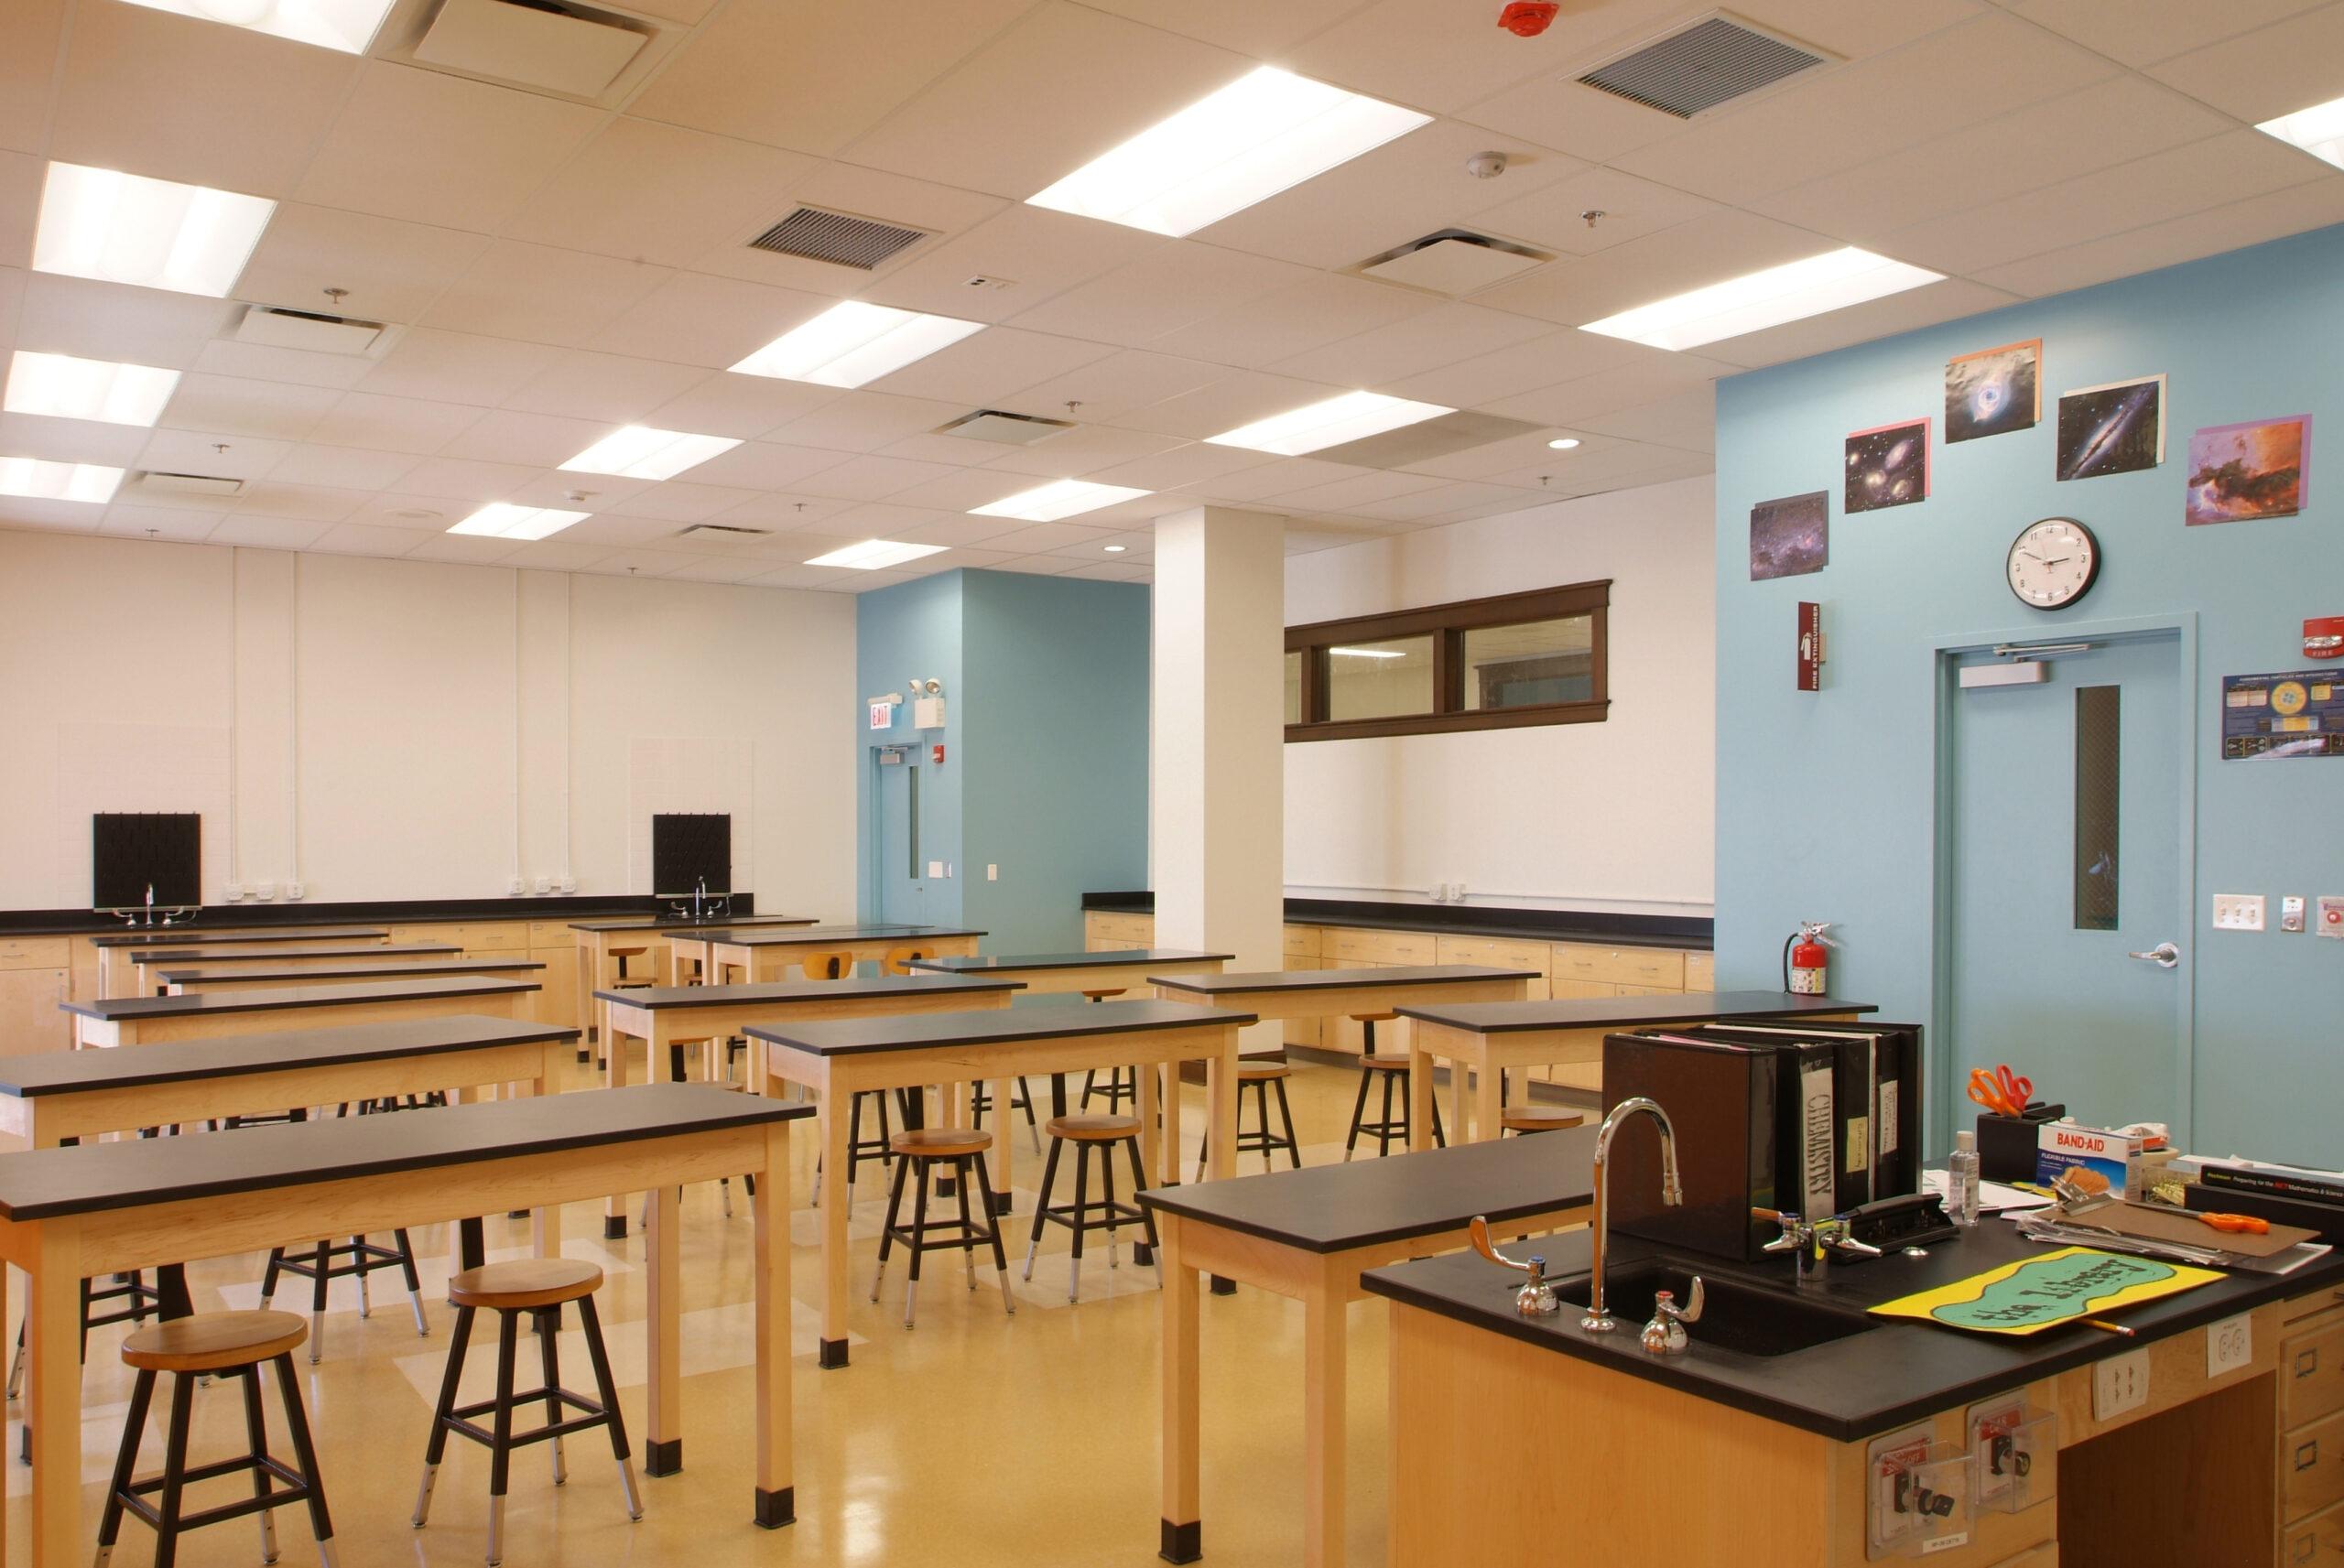 Classroom view at Ralph Ellison High School.